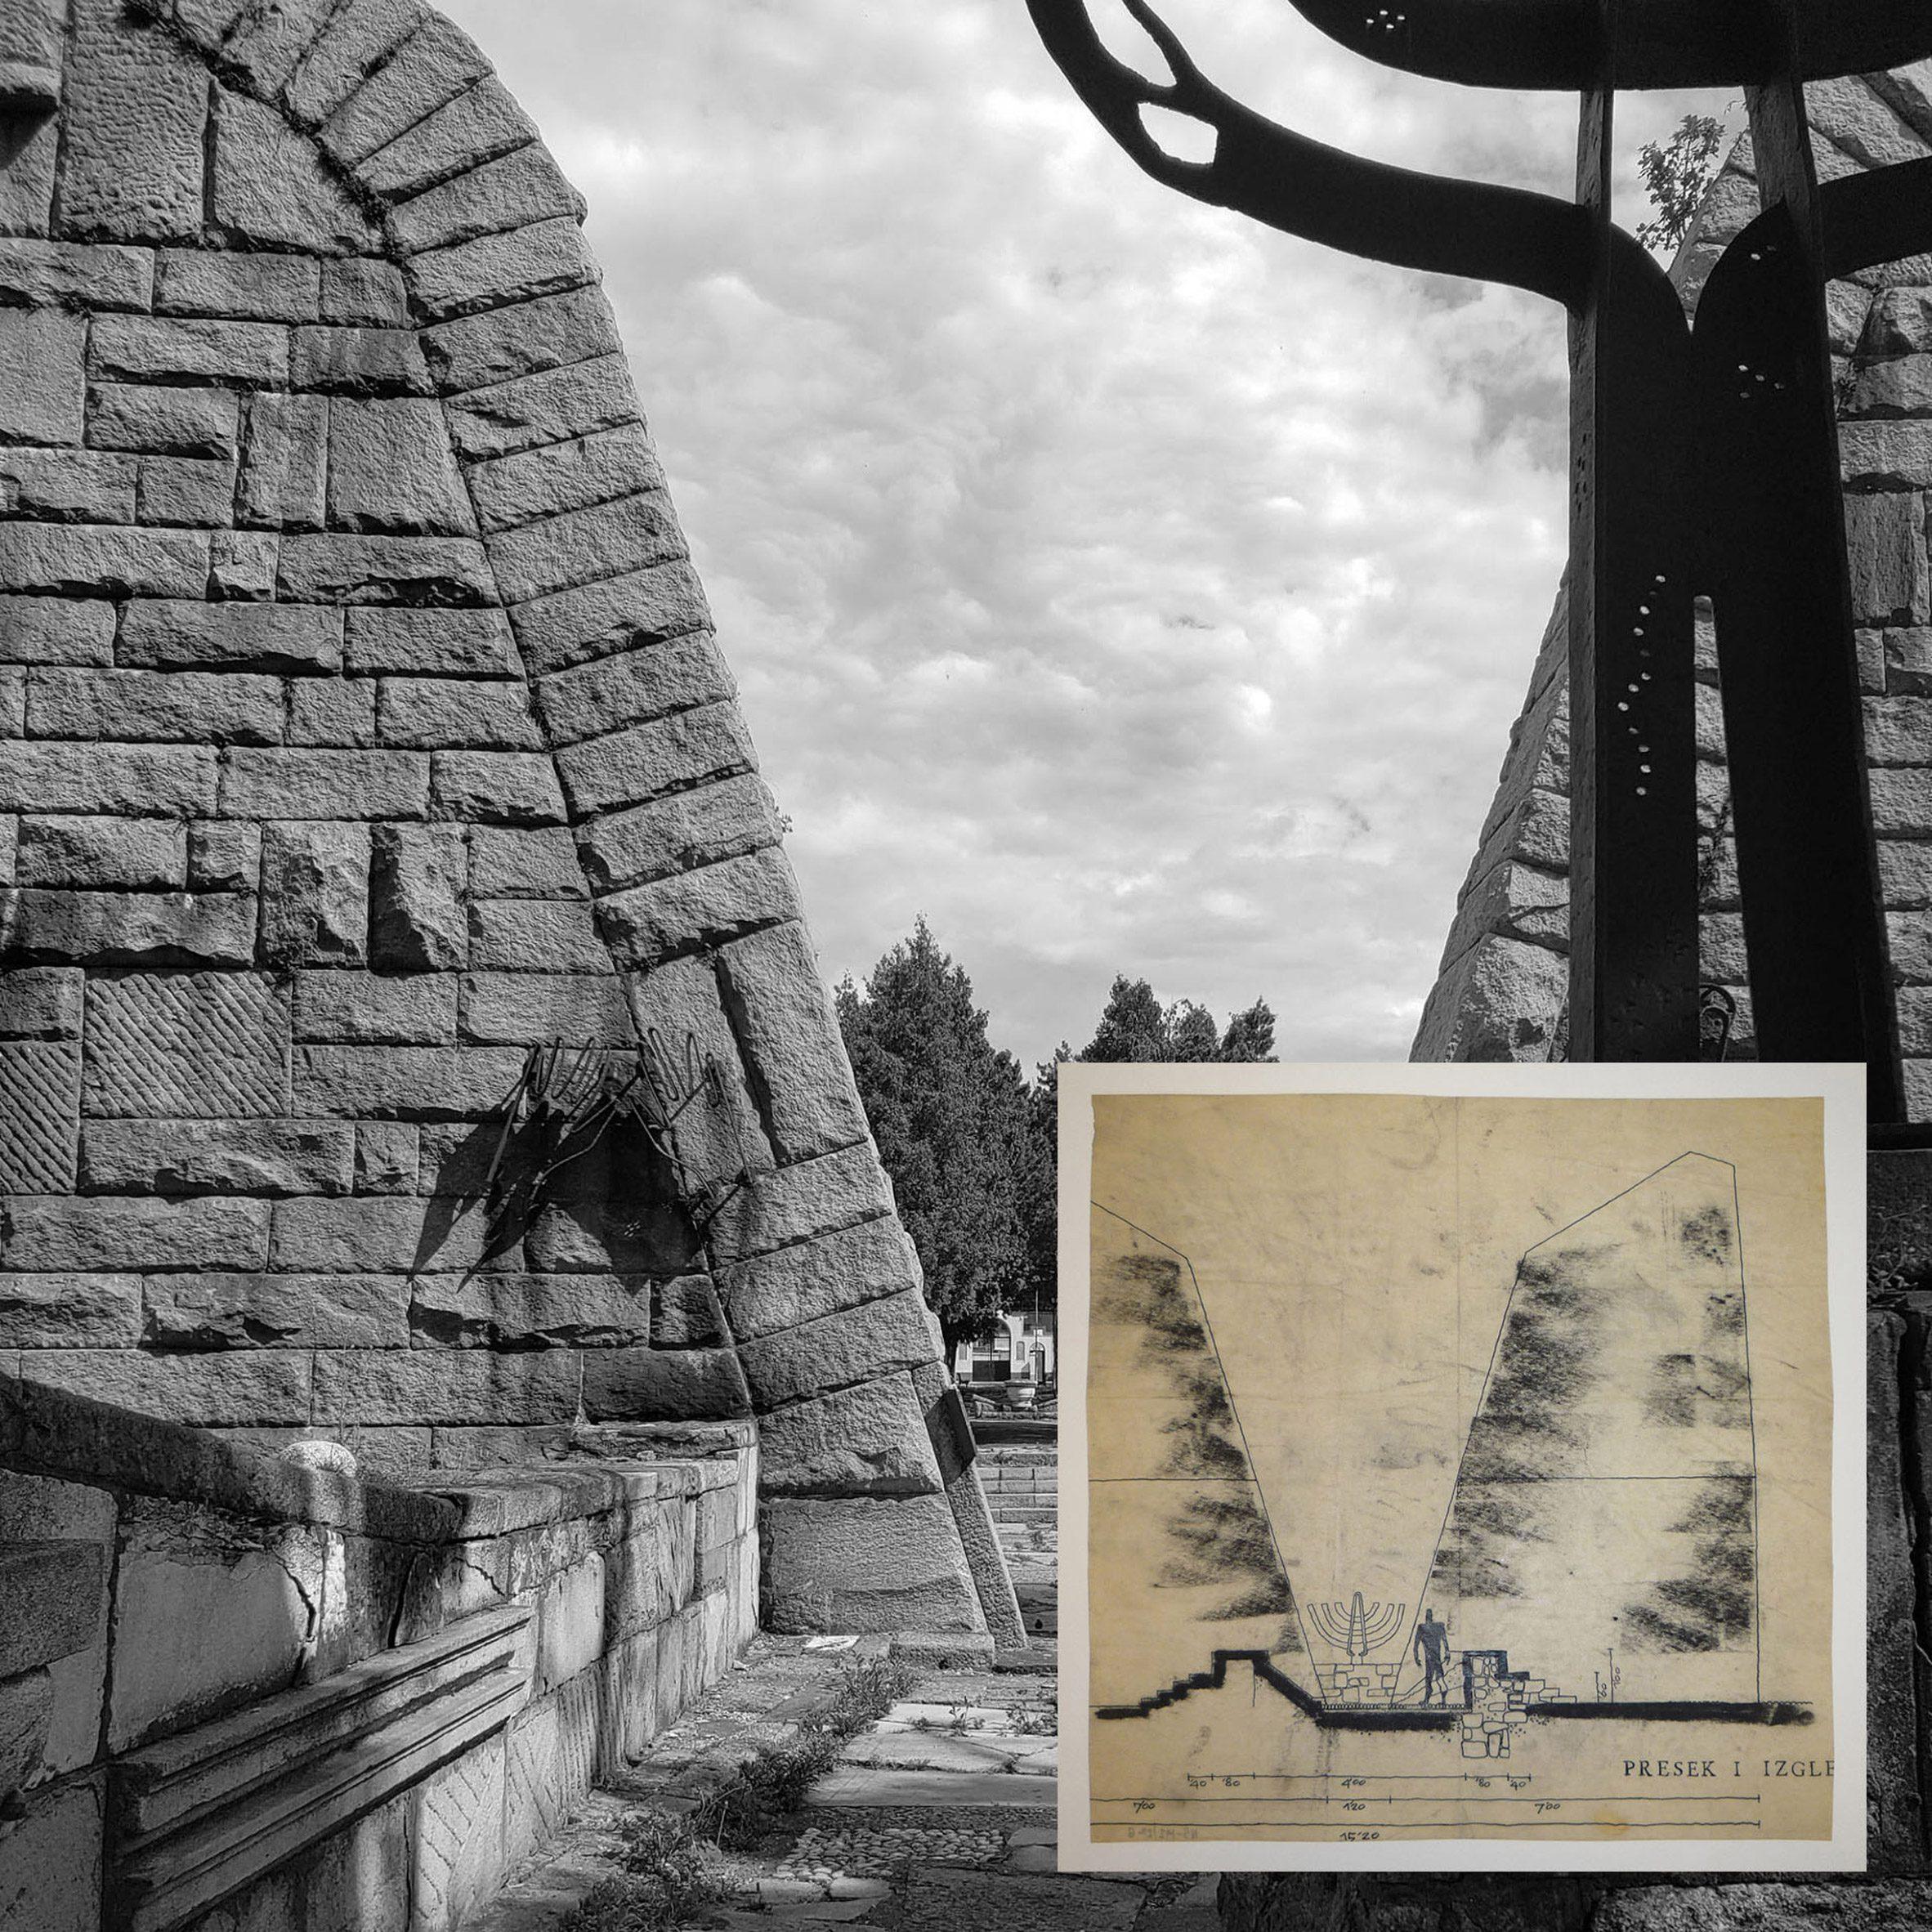 A photograph and drawing of buildings by Bogdan Bogdanović